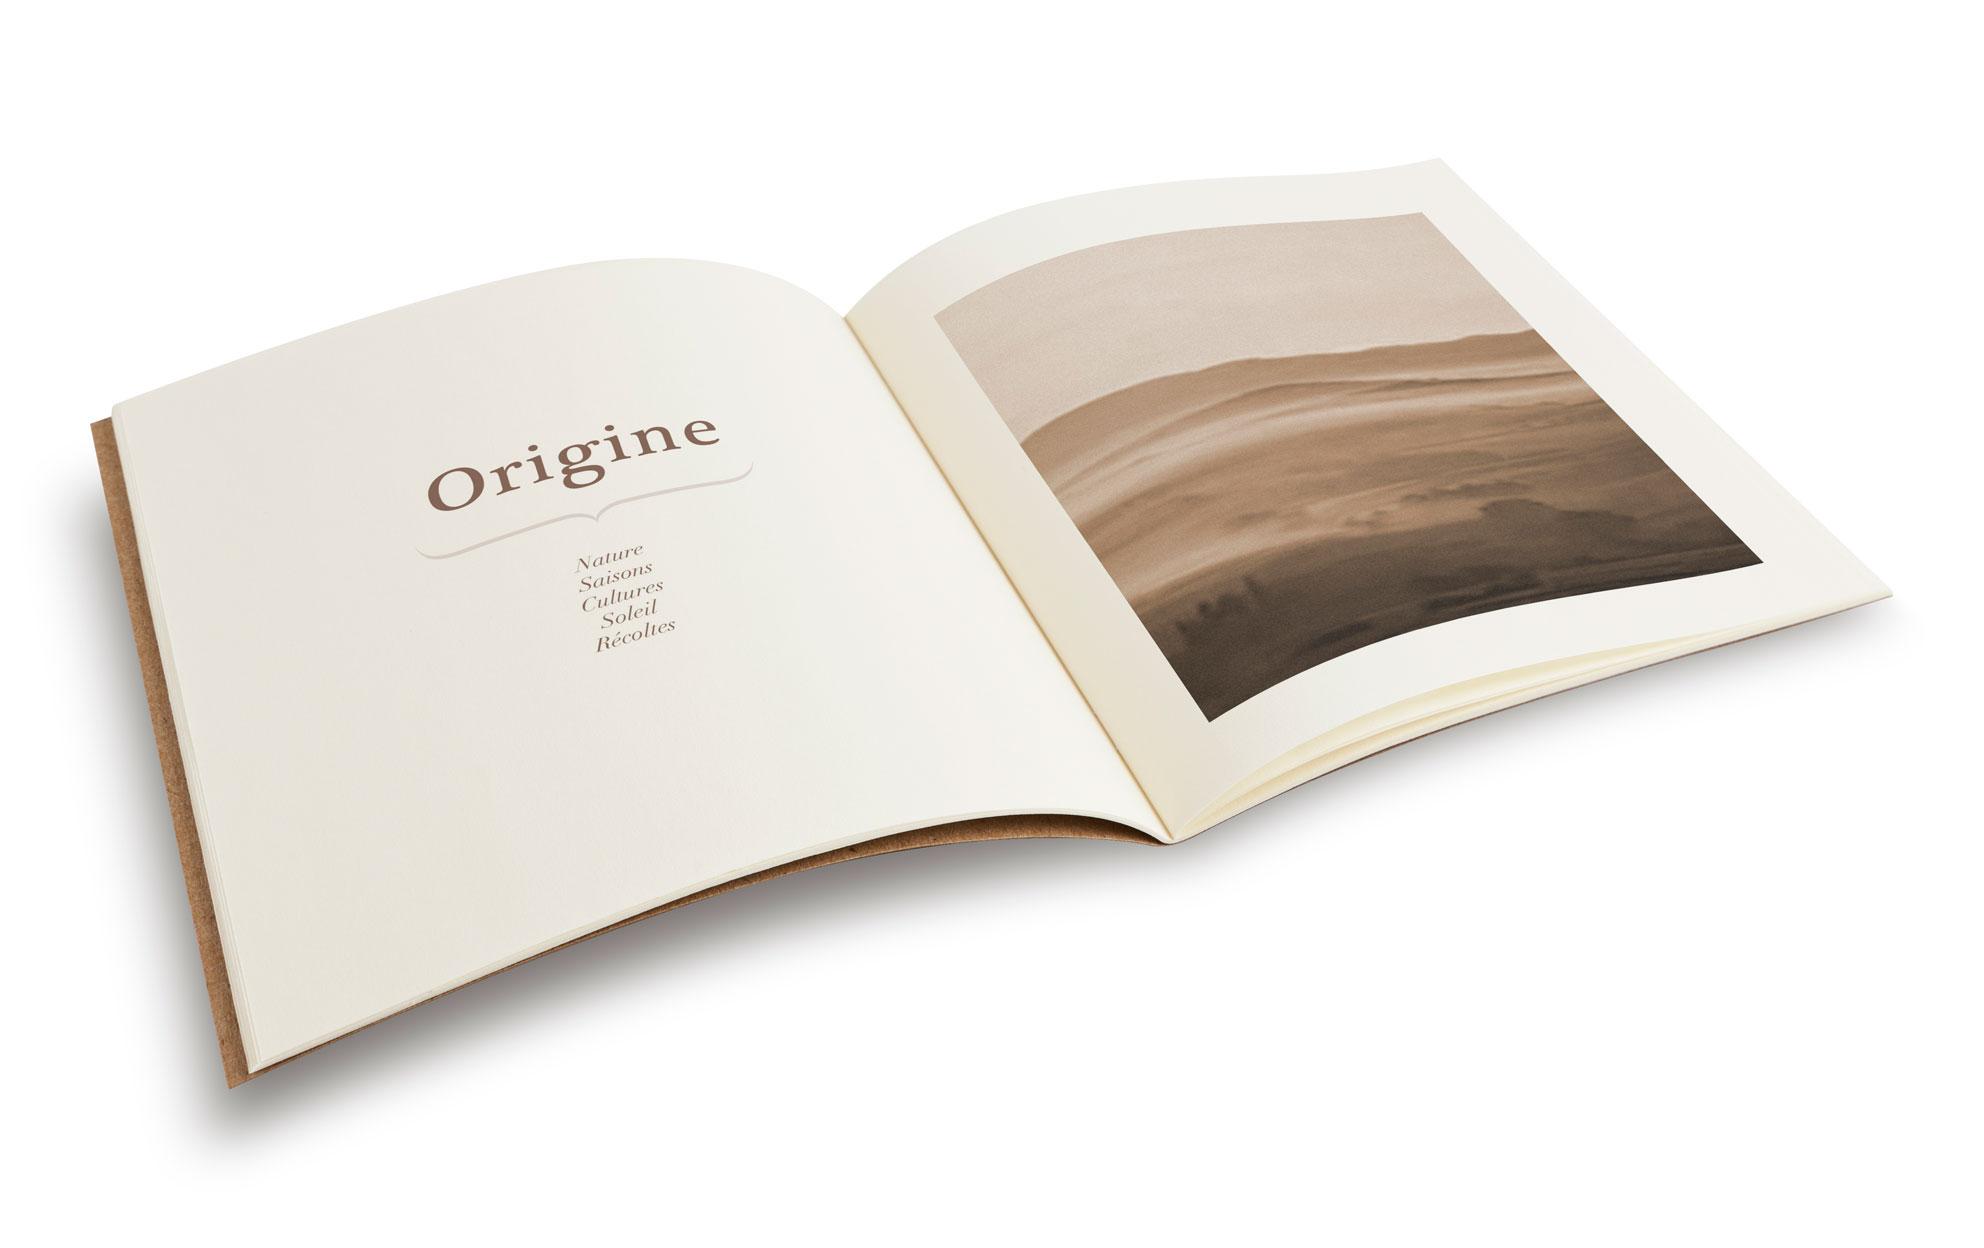 creation-design-graphique-identite-visuelle-adn-de-marque-naming-logo-herboristerie-nico-nico-nicolas-vignais-designer-graphique-independant-identite-visuelle-packaging-bordeaux-france-3